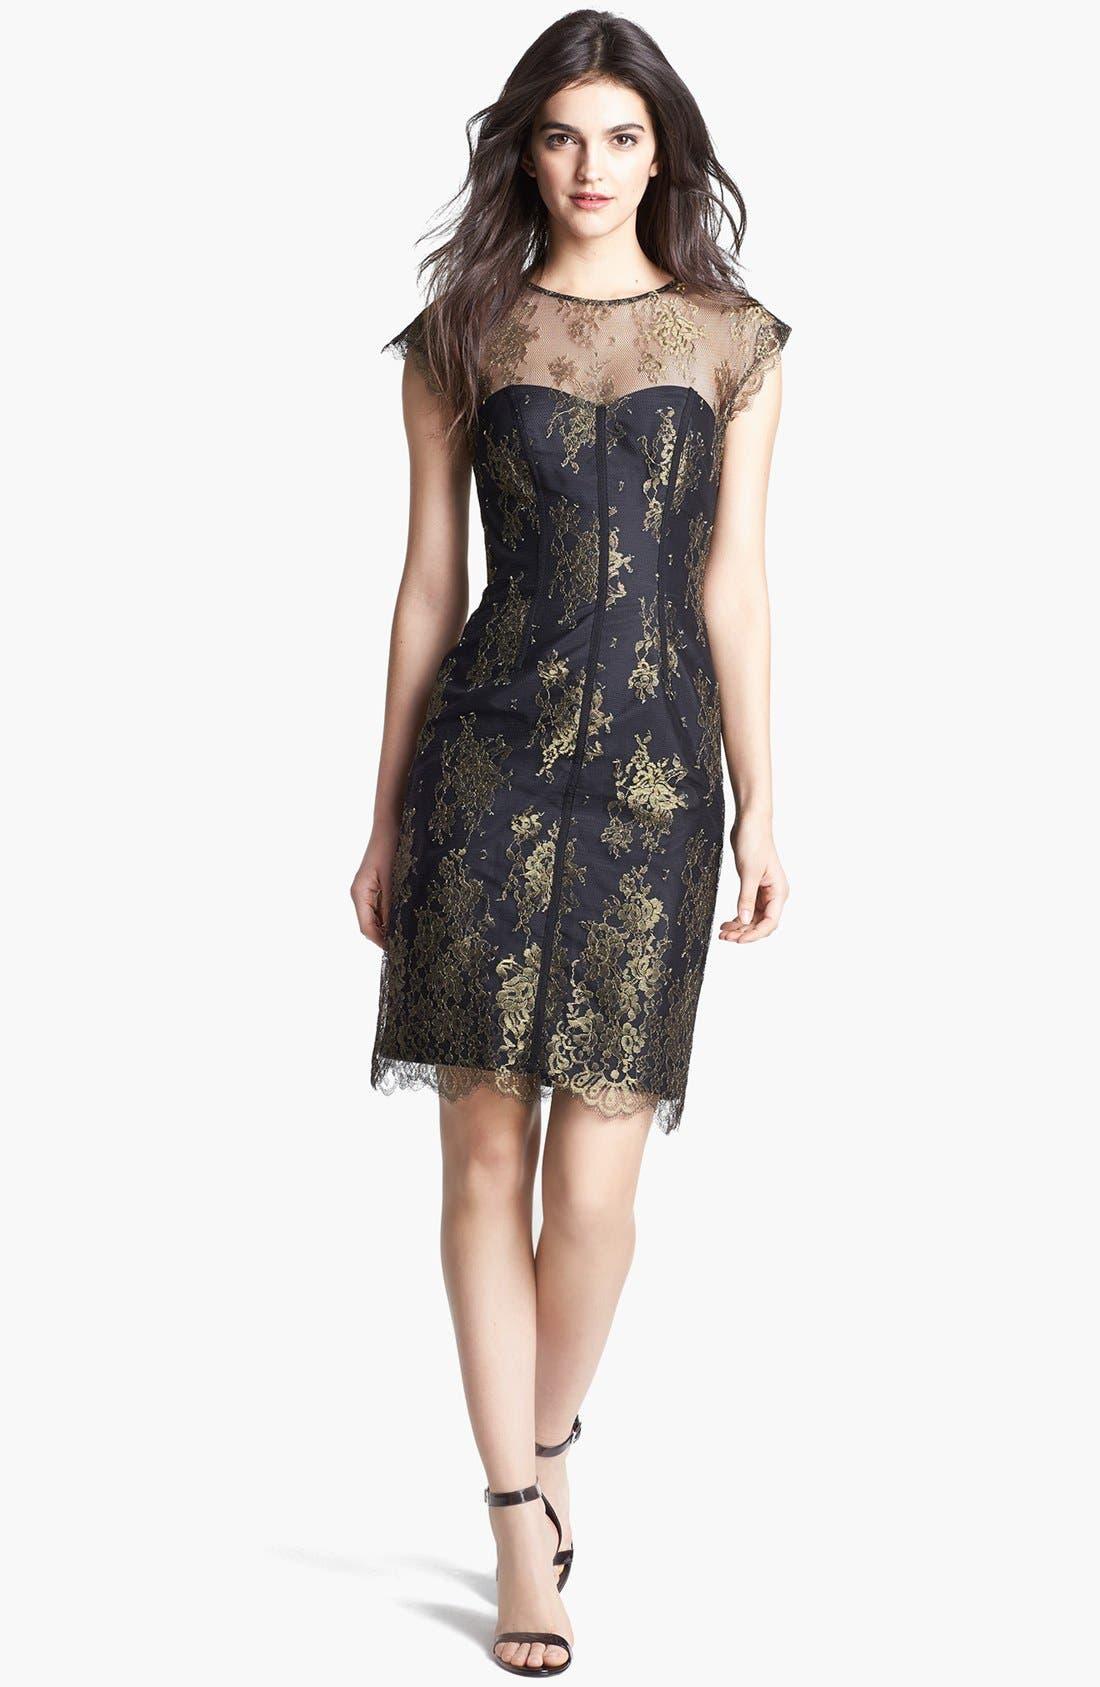 Alternate Image 1 Selected - ML Monique Lhuillier Illusion Yoke Metallic Lace Dress